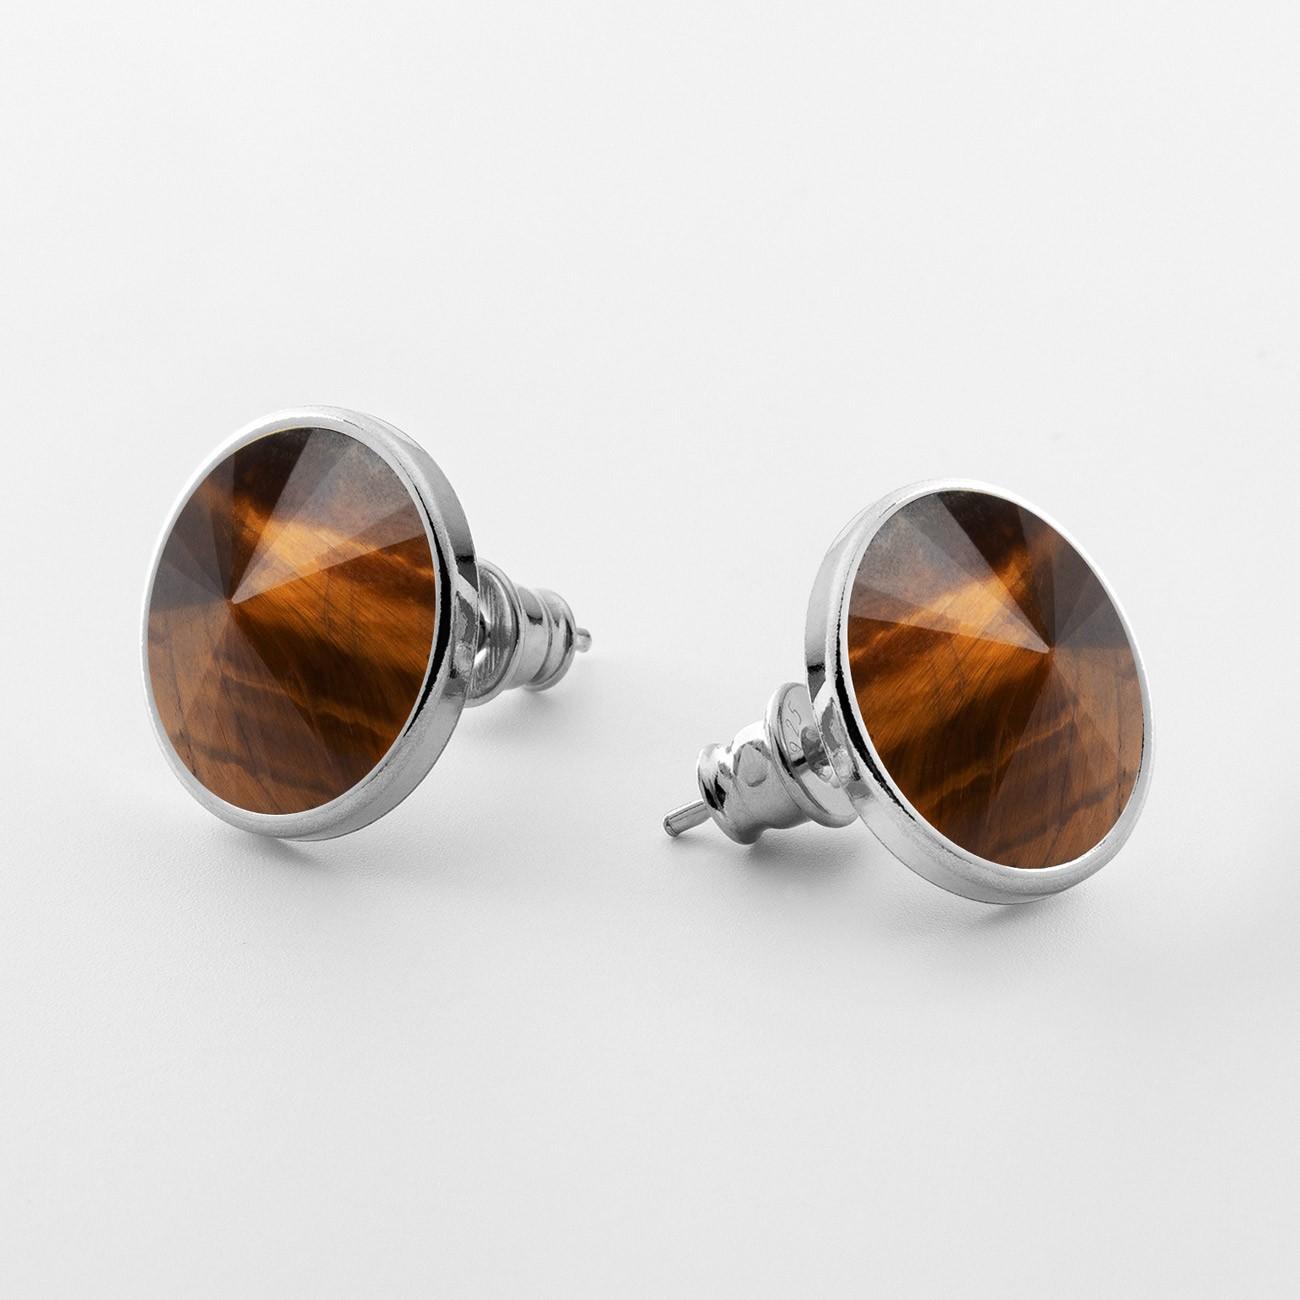 Srebrne kolczyki z naturalnym kamieniem, srebro 925